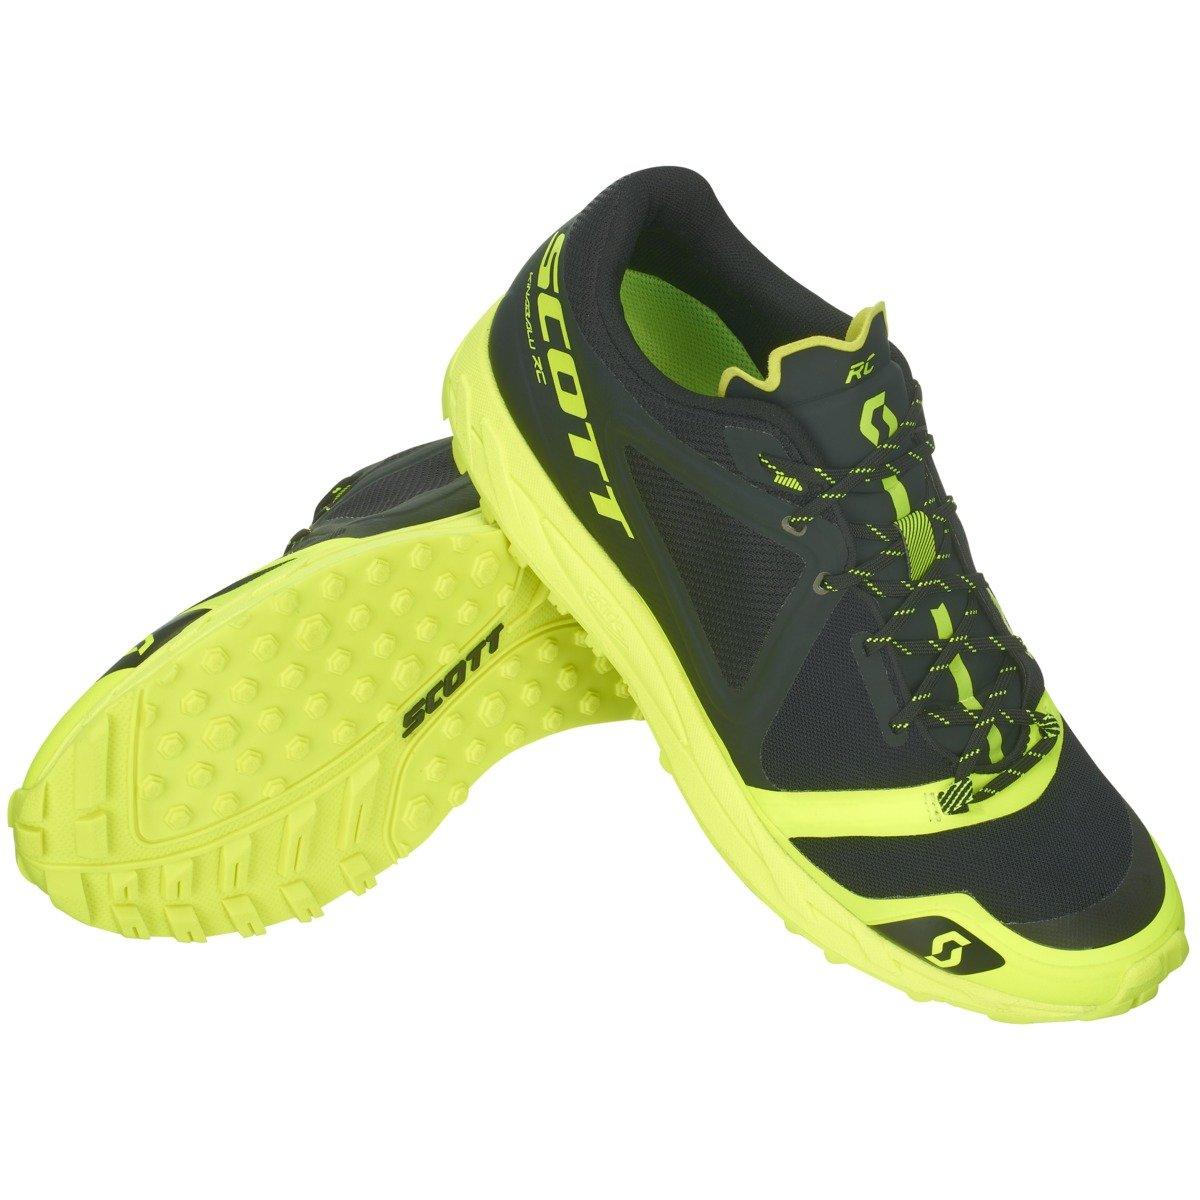 SCOTT(スコット) Shoe Kinabalu RC black/yellow 7.0 US/25.0cm 2518771040004 B06XCKVX8L